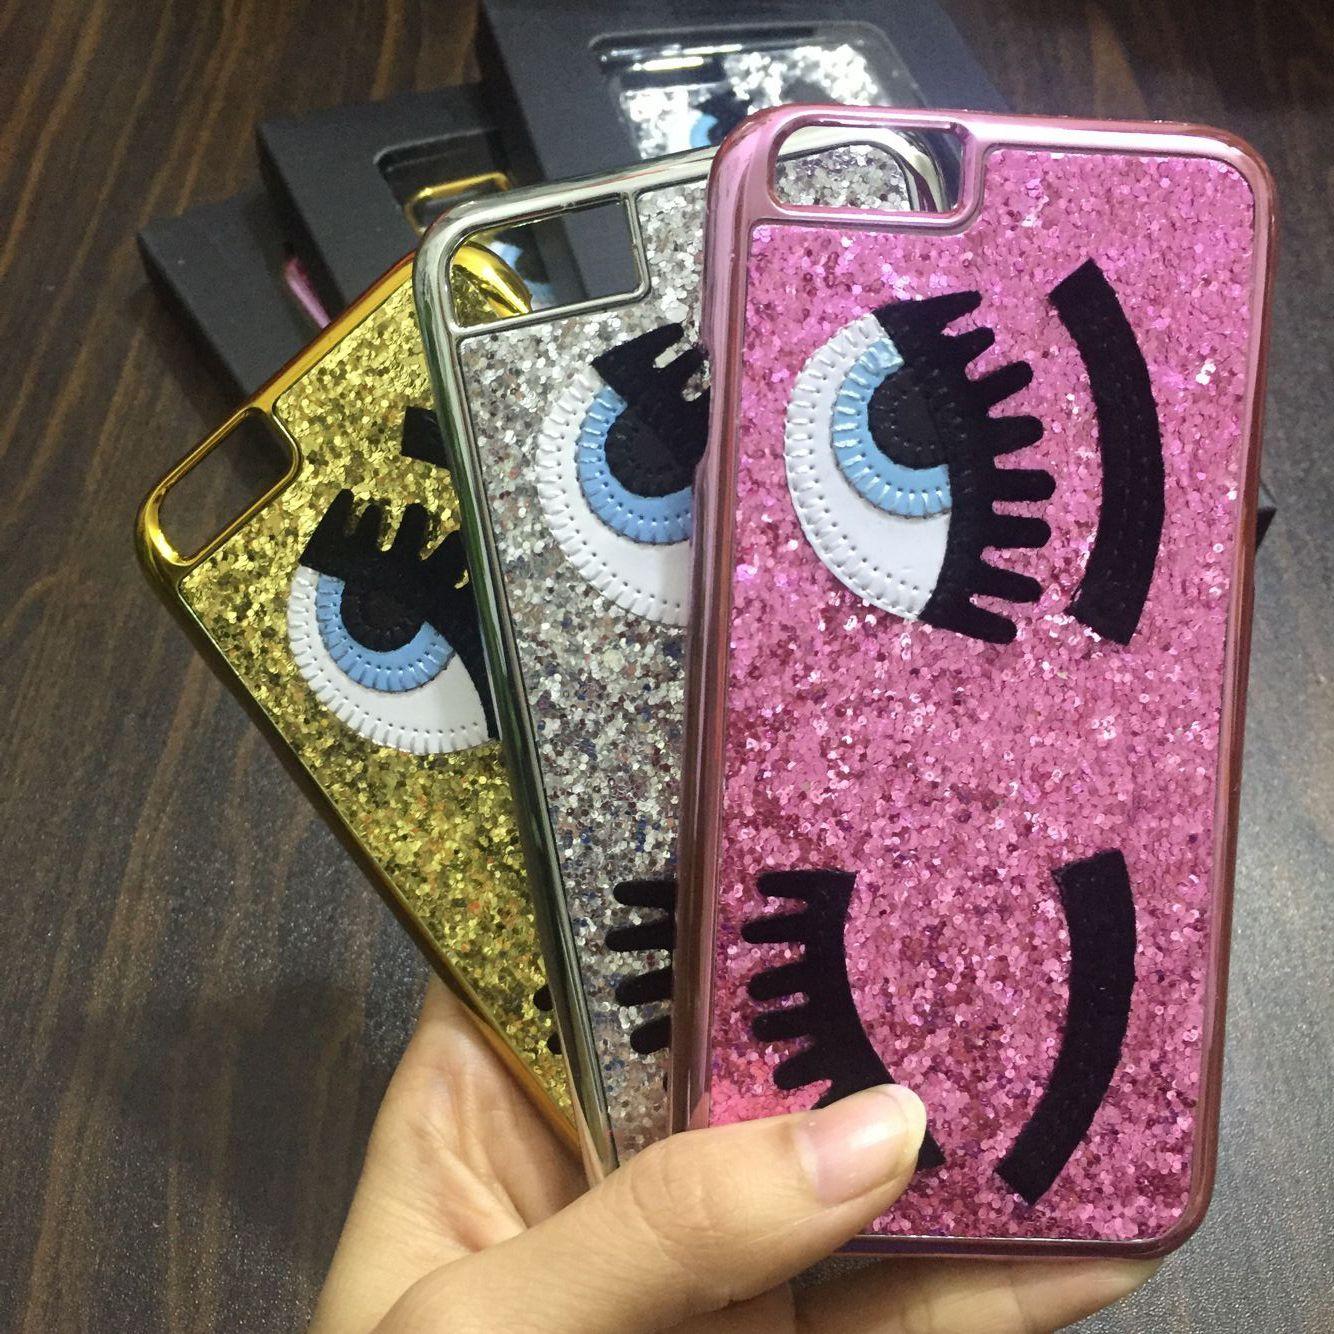 best website 9f0a5 6fc5b Glitter powder fashion chiara ferragni Bling big eyes eyelashes PC Plating  back Cover phone Cases for iPhone x 8 7 6 6S Plus